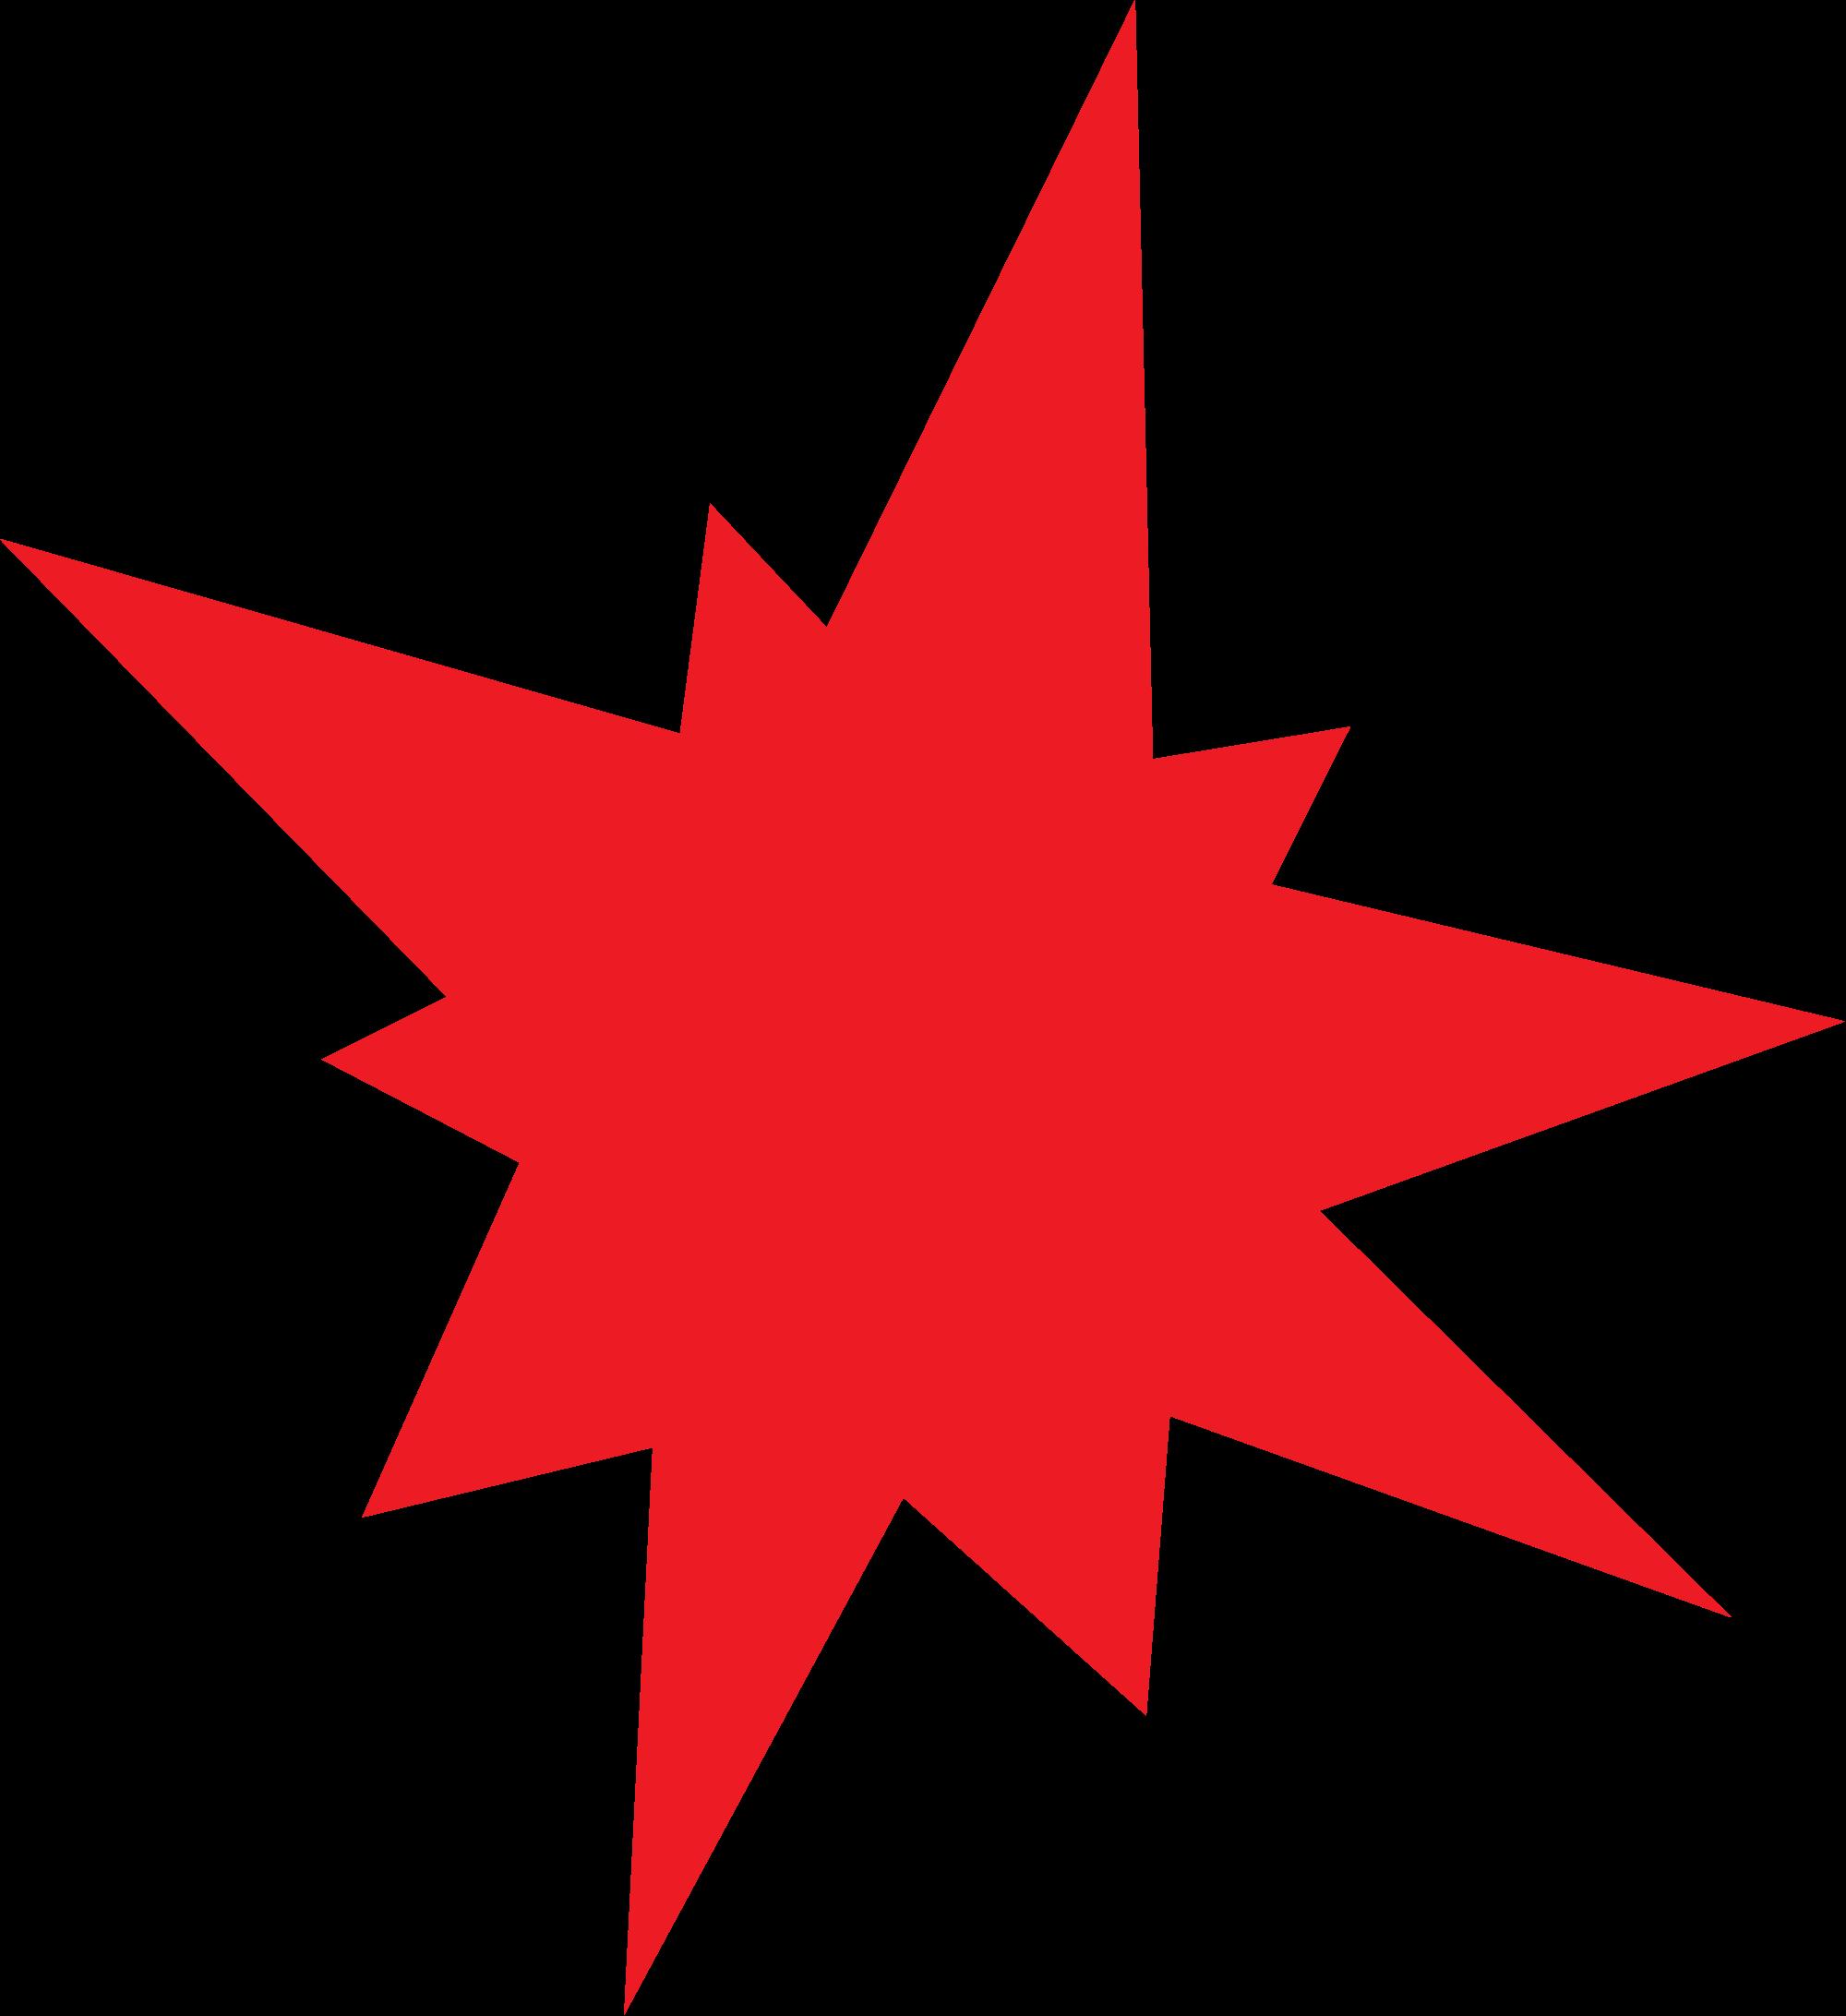 Explosion clipart border. File svg wikimedia commons